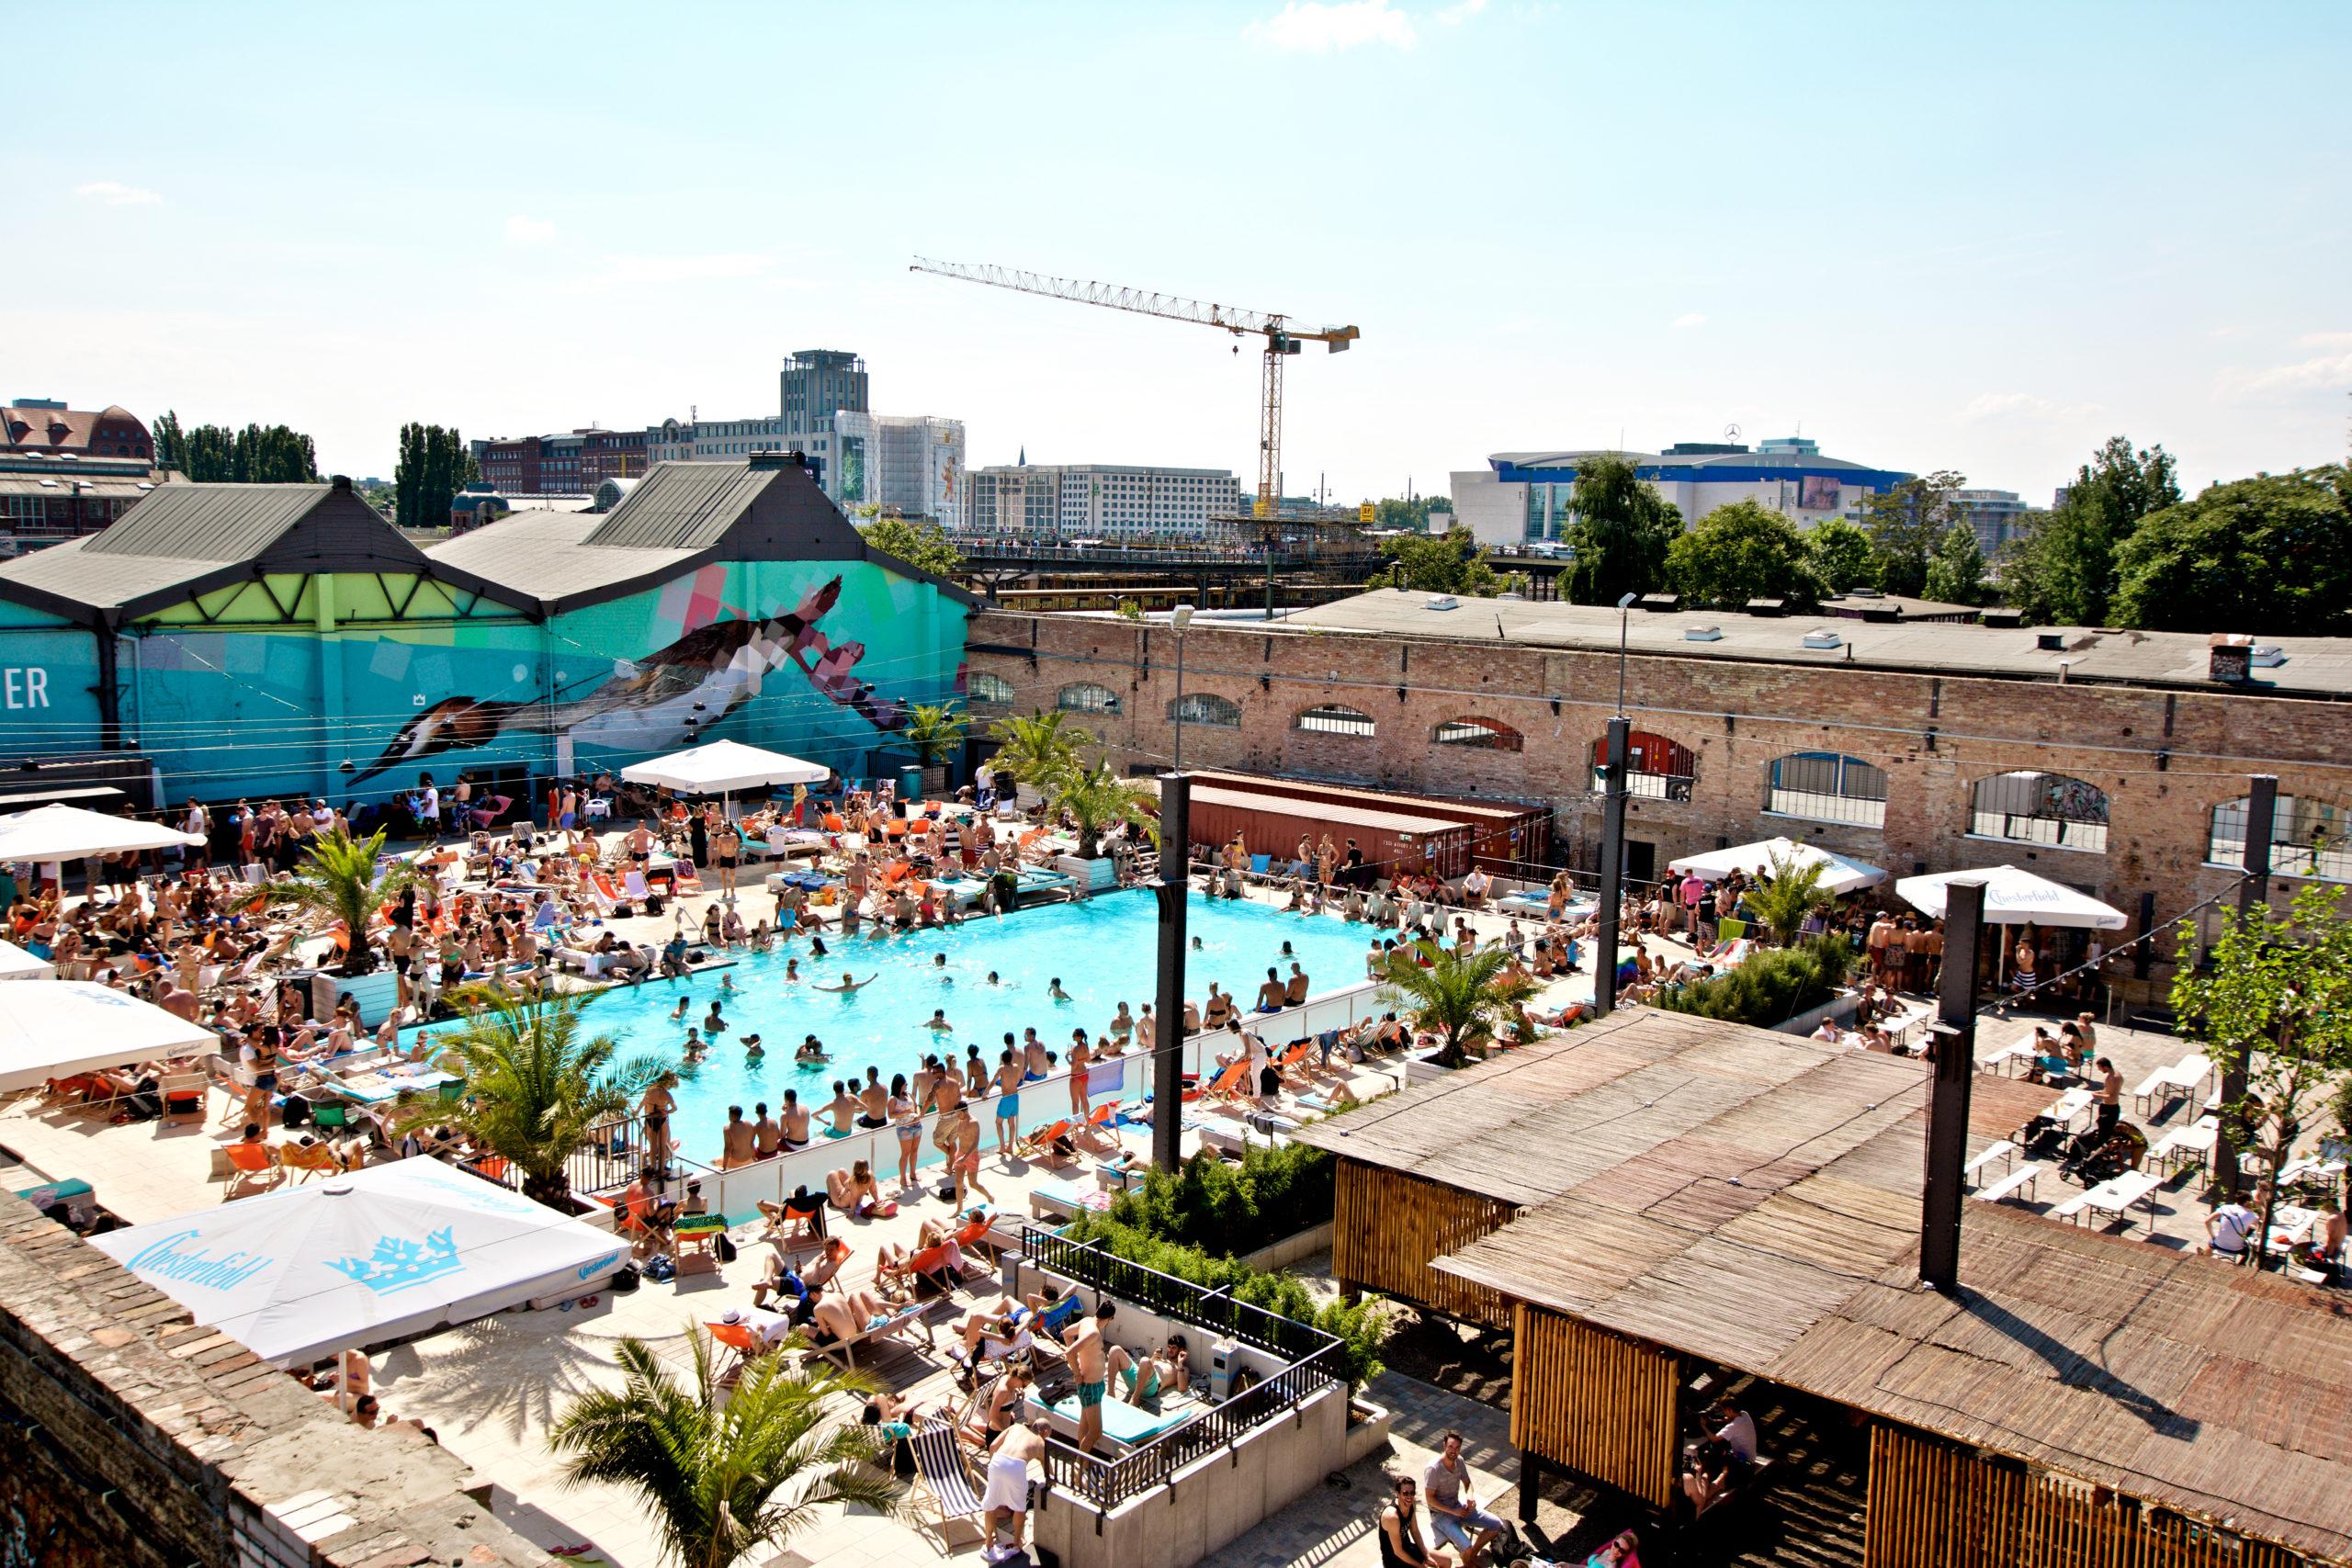 12 Strandbars In Berlin Hier Gibt Es Kuhle Drinks Sand Und Sonne Satt